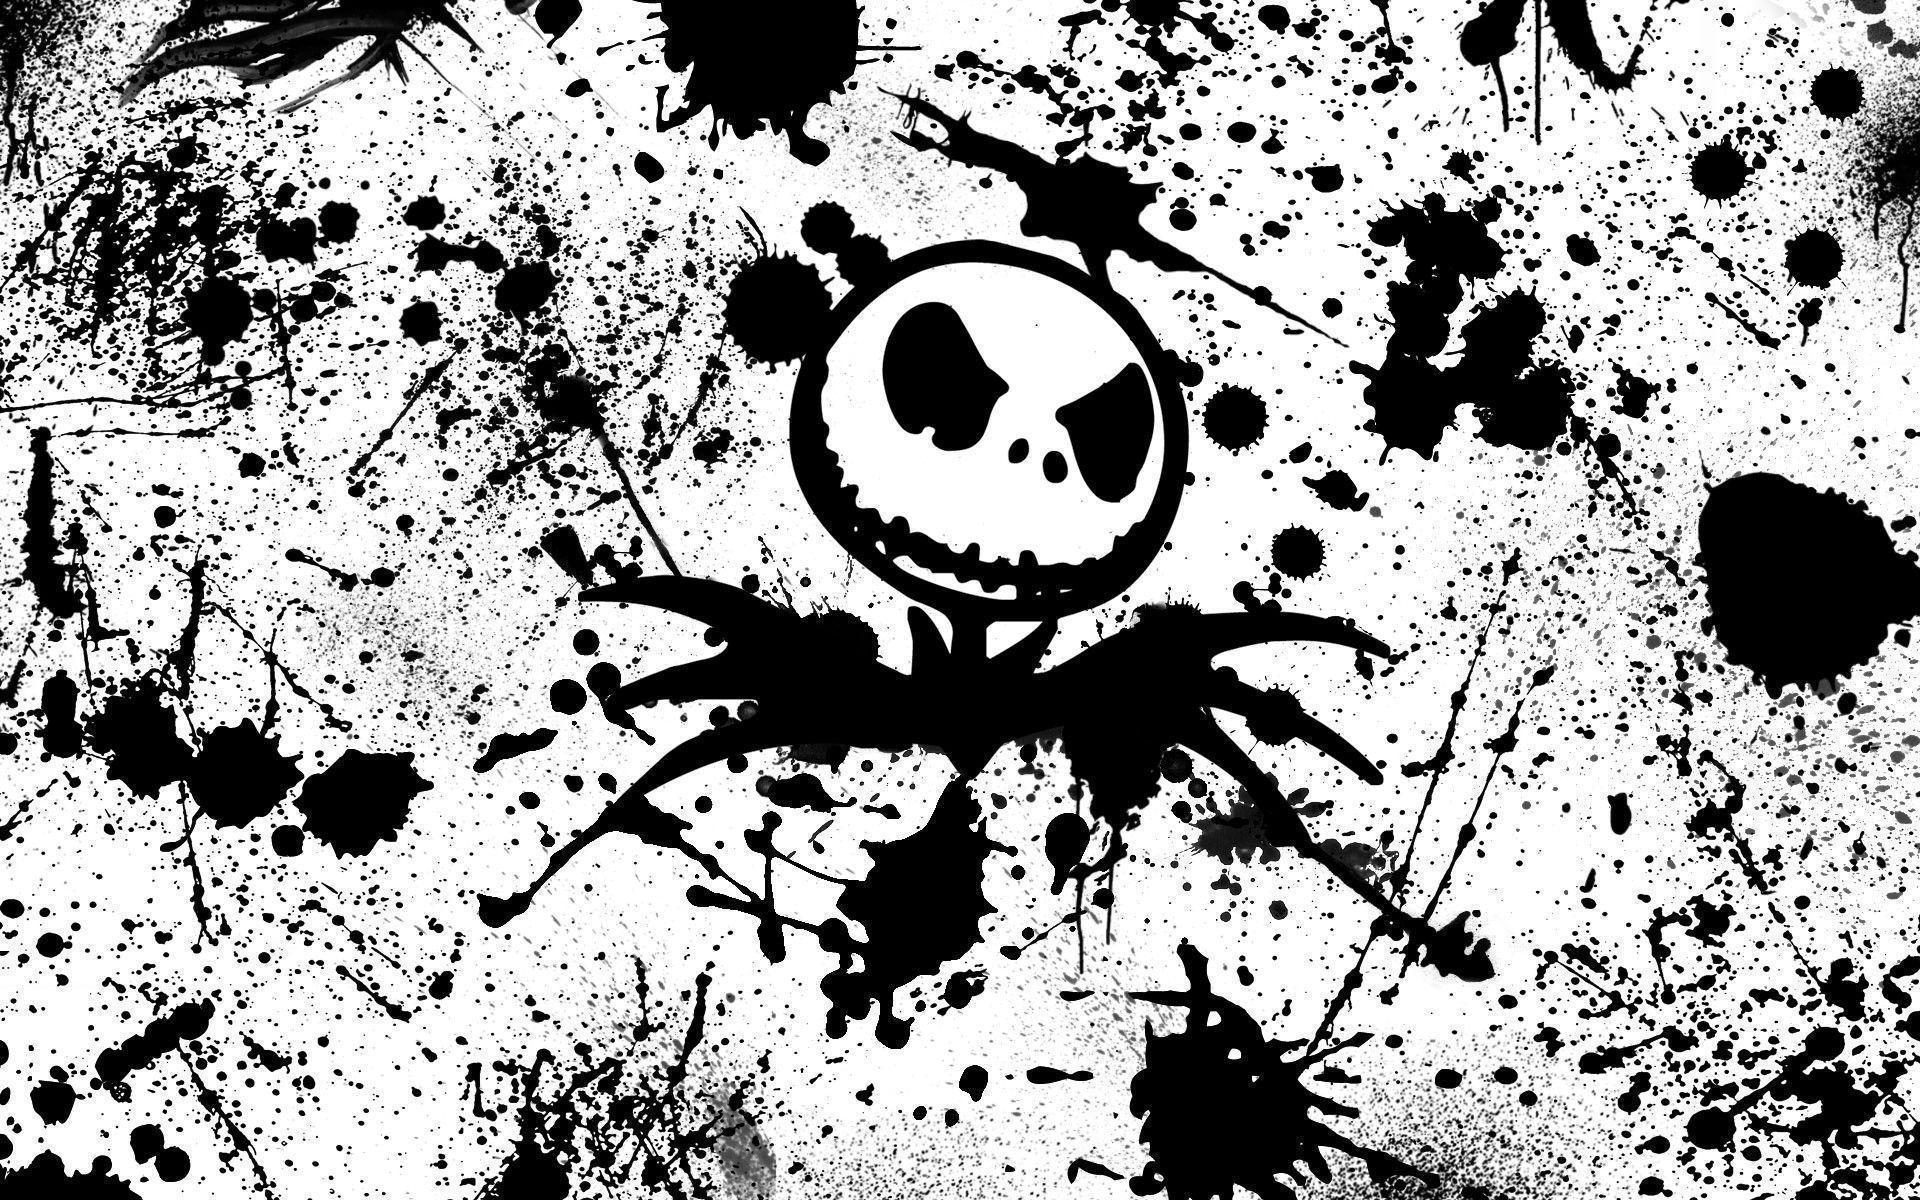 halloween skeleton wallpaper - photo #37